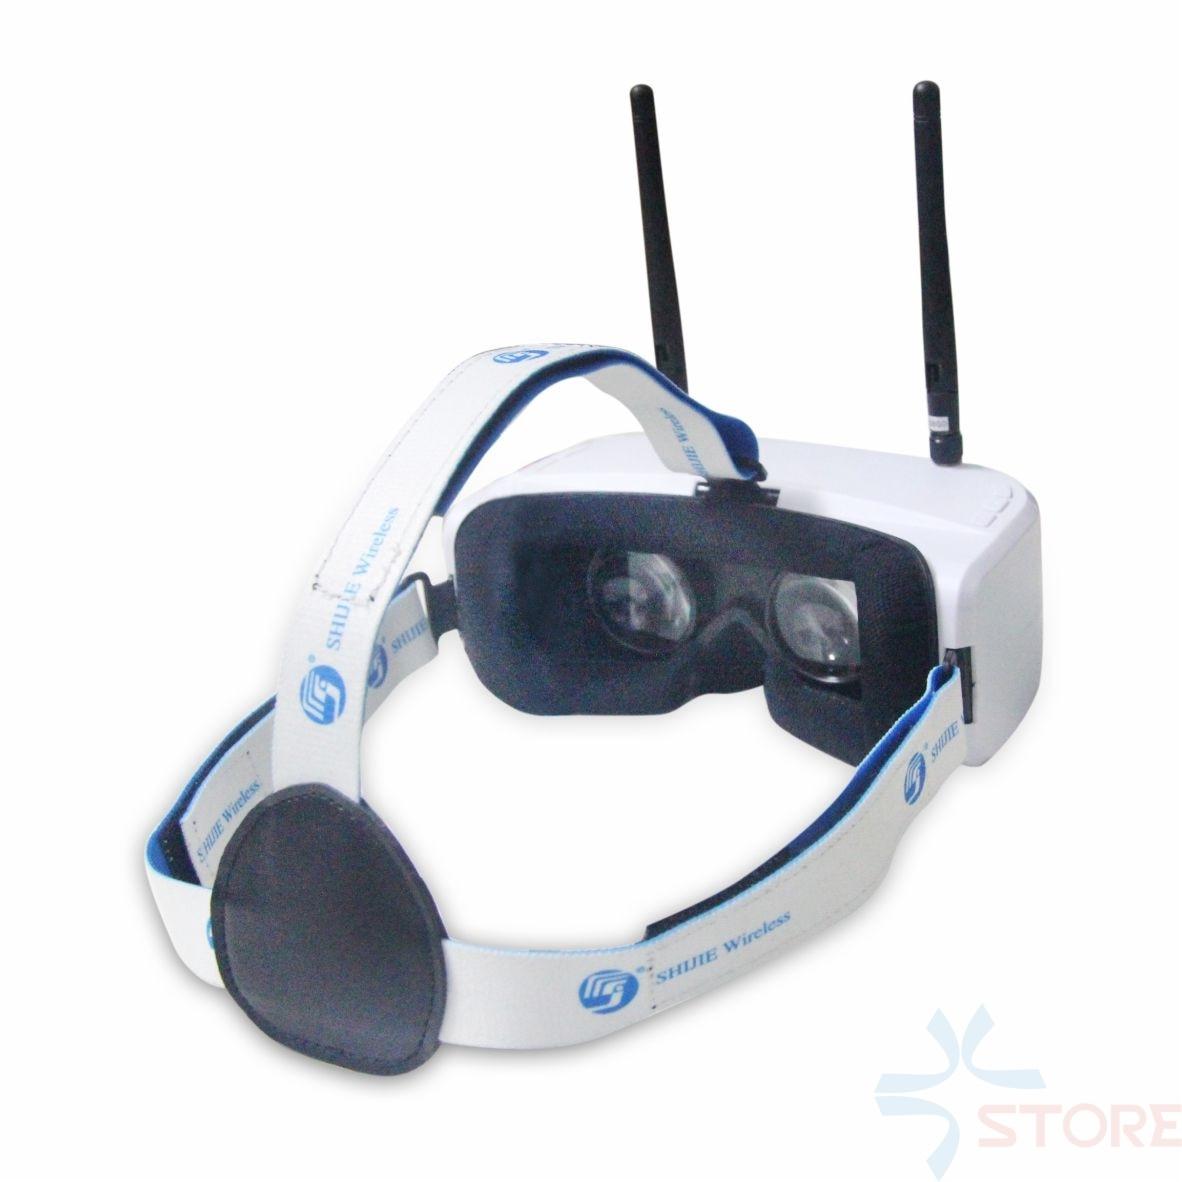 SJ RG01 5.8G 48CH Dual-Displays Diversity FPV Video Goggles w/ 3.7V 1500mAh Battery DVR